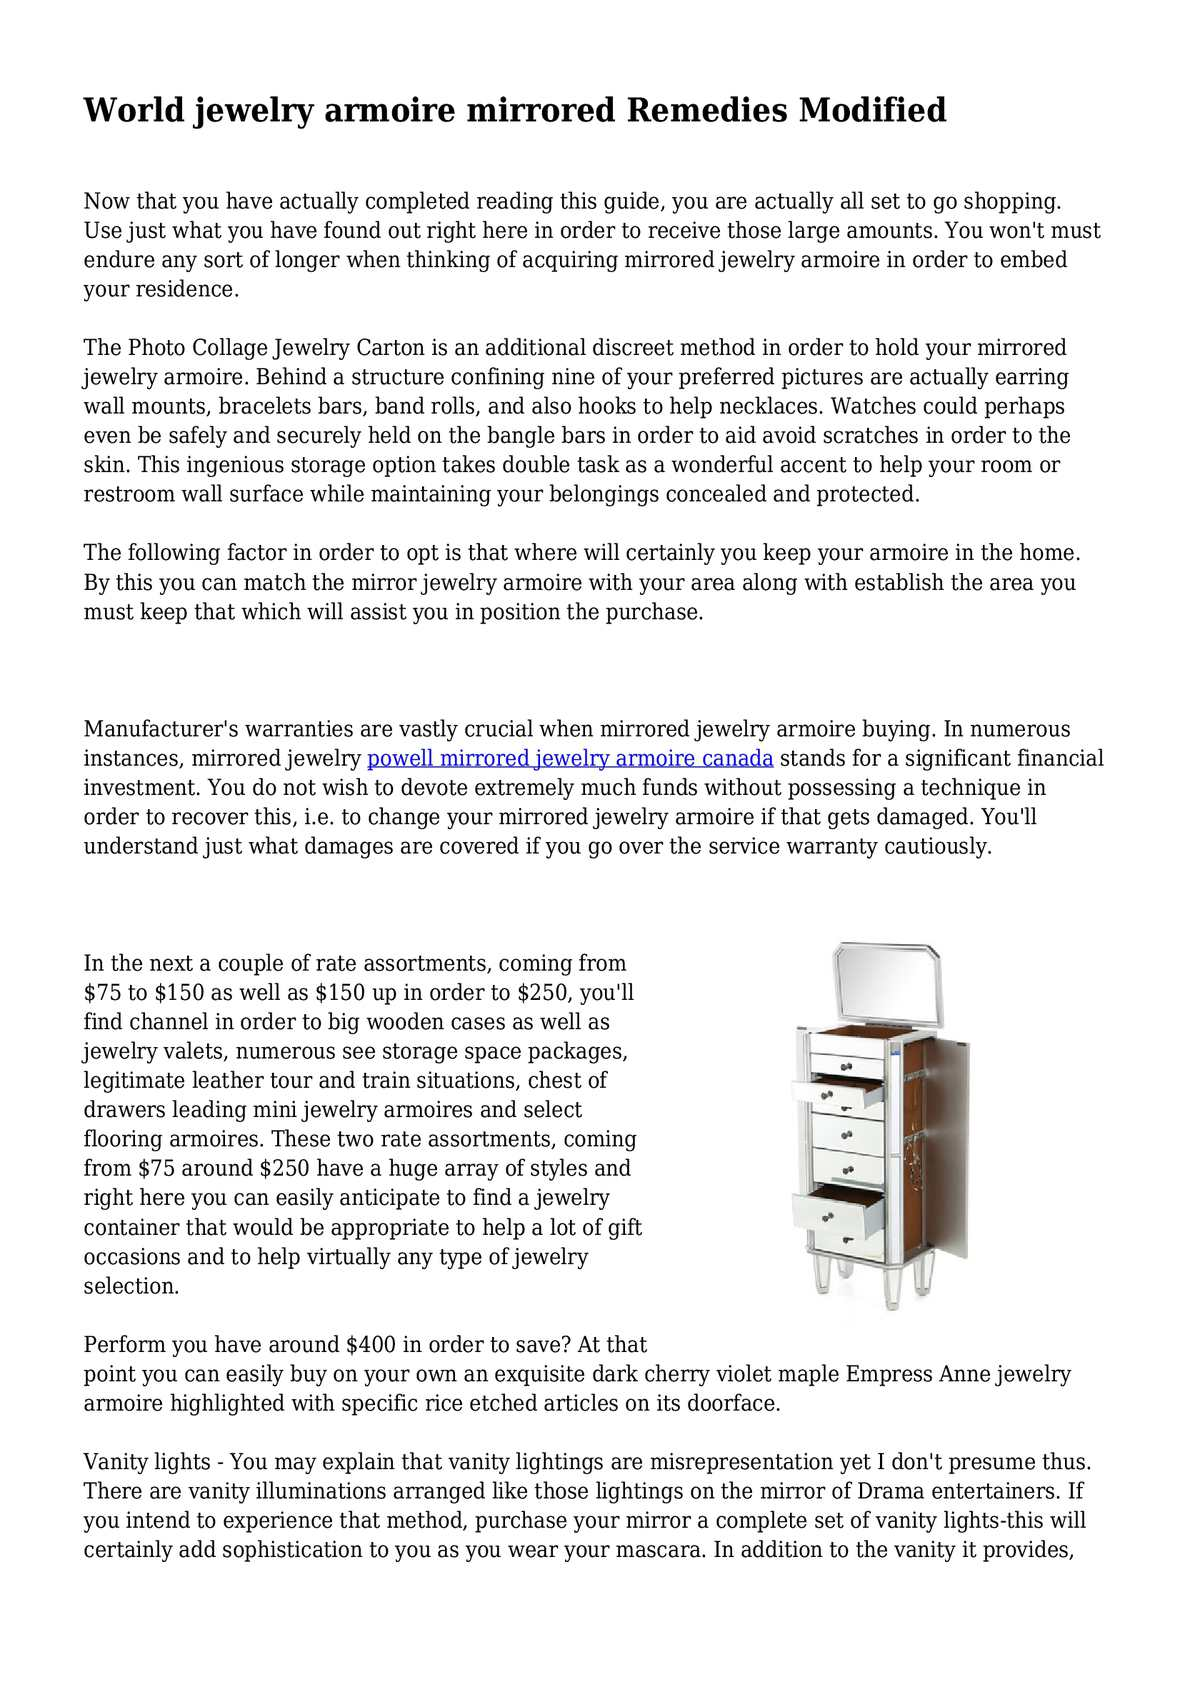 Calameo World Jewelry Armoire Mirrored Remedies Modified